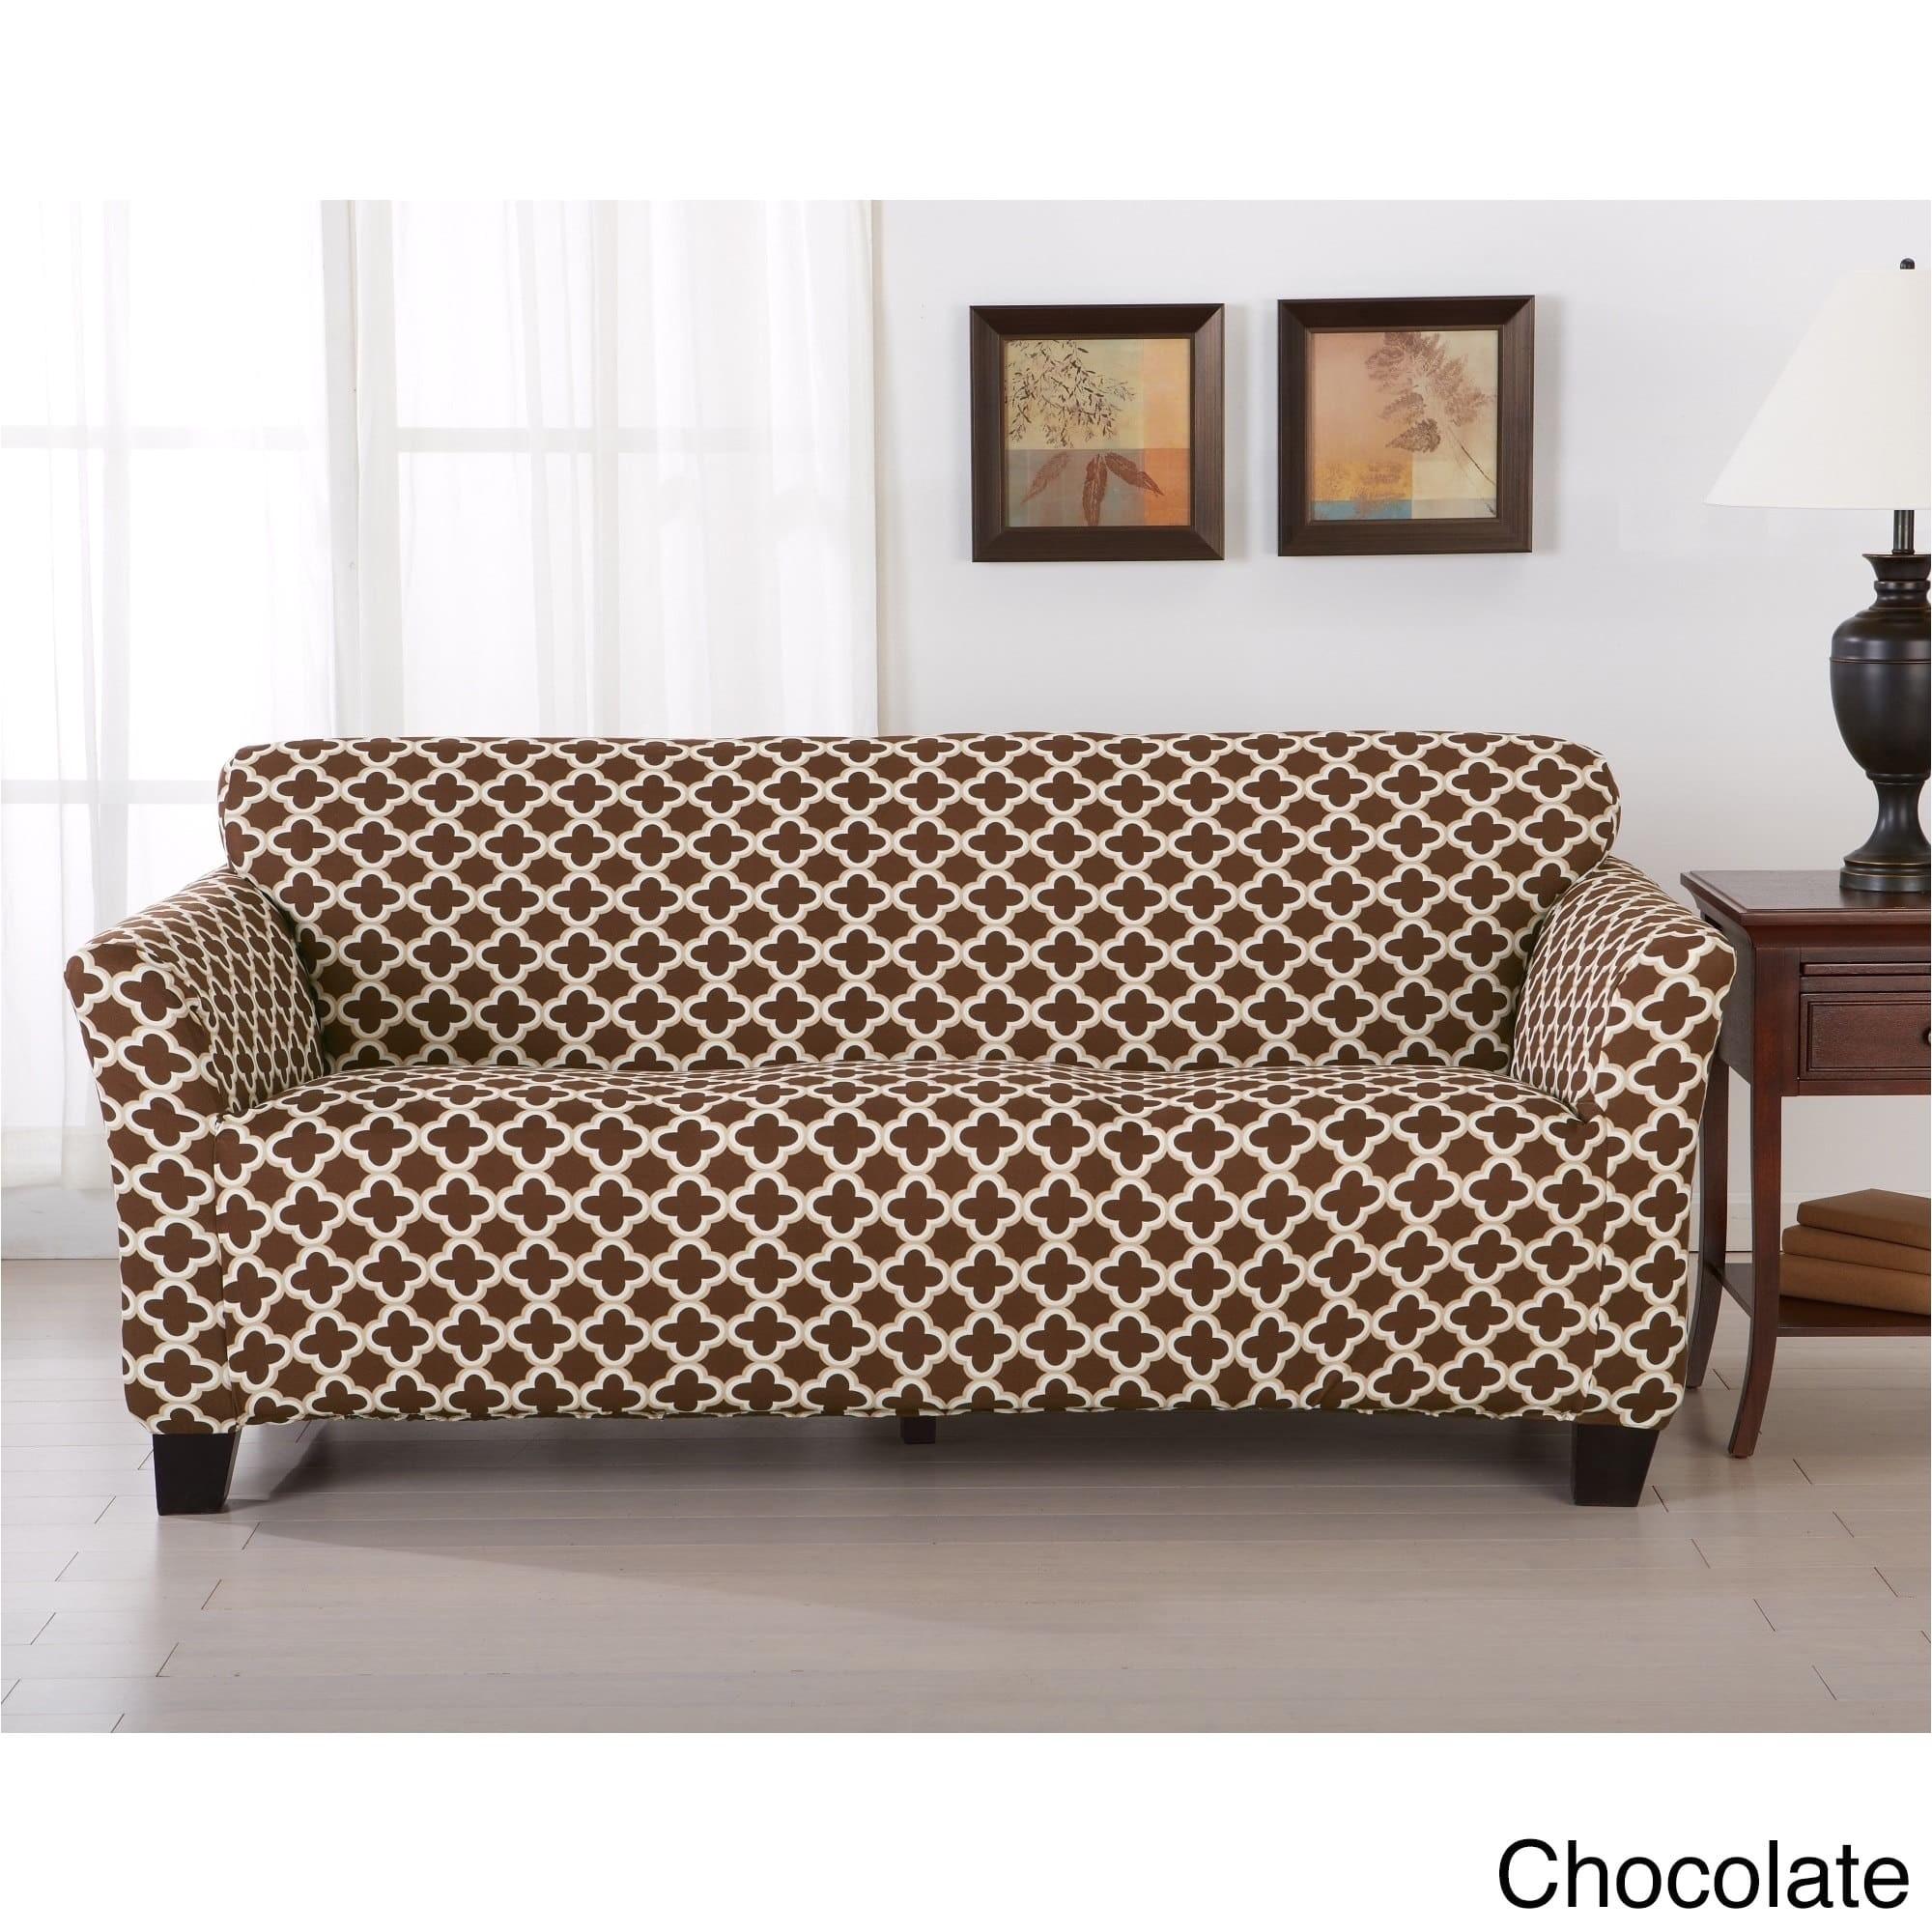 Ll Bean sofa Slipcover Shop Home Fashion Designs Brenna Collection Trellis Print Stretch